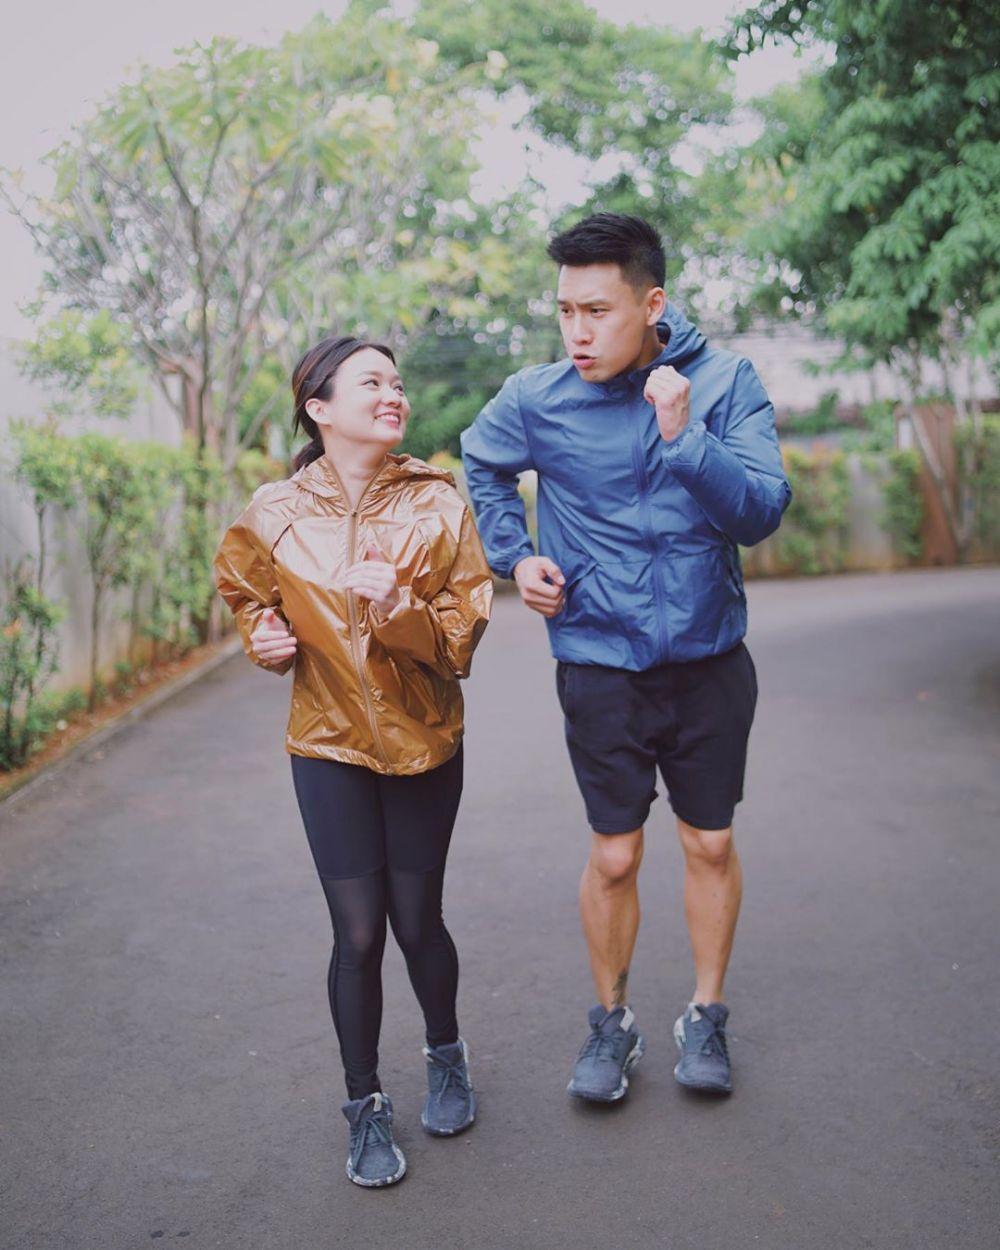 Momen mesra Fendy Chow dan sang istri © 2020 brilio.net